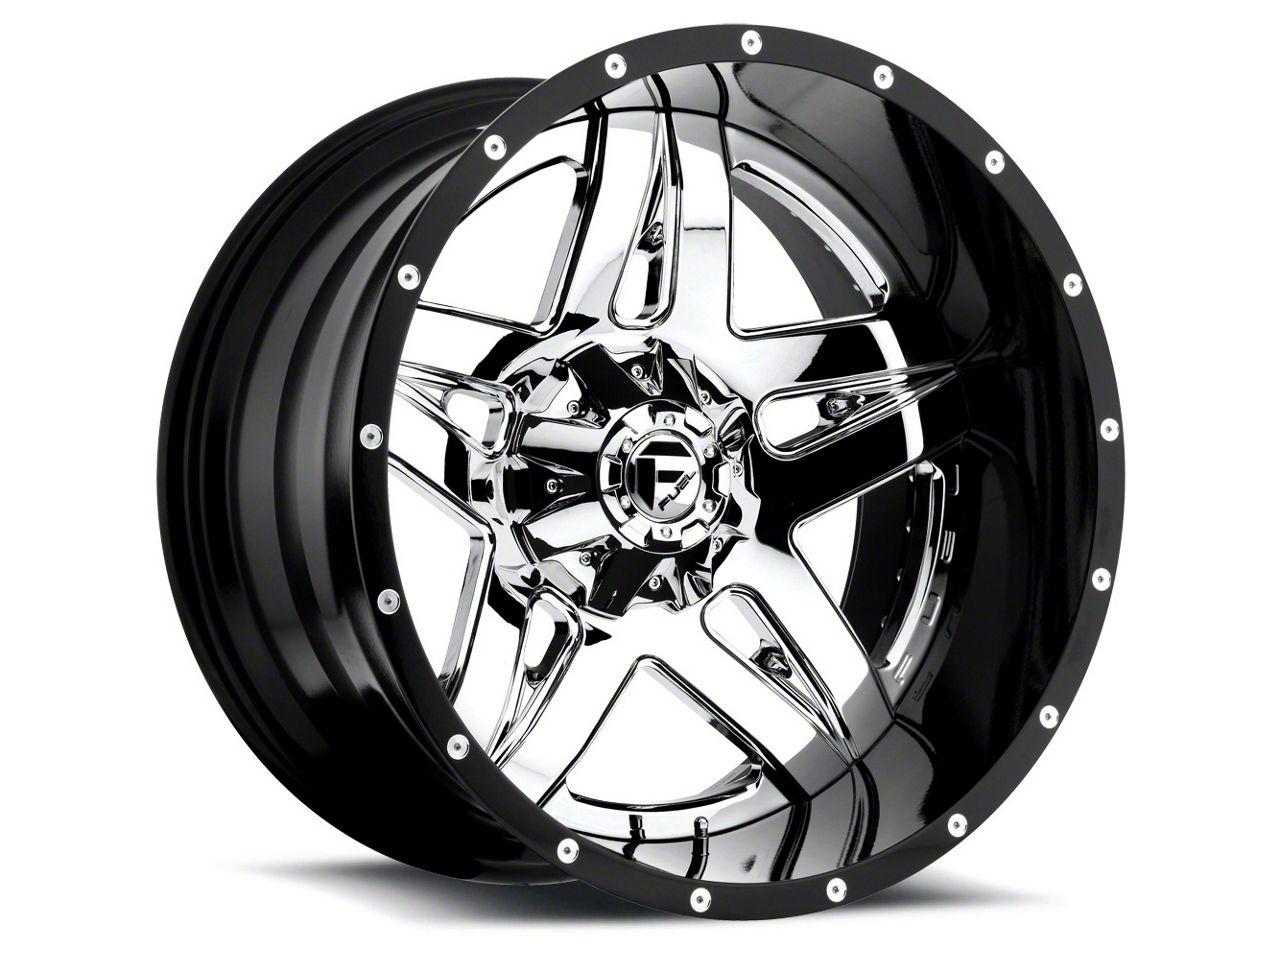 Fuel Wheels Full Blown Chrome 6-Lug Wheel - 22x14 (07-18 Sierra 1500)